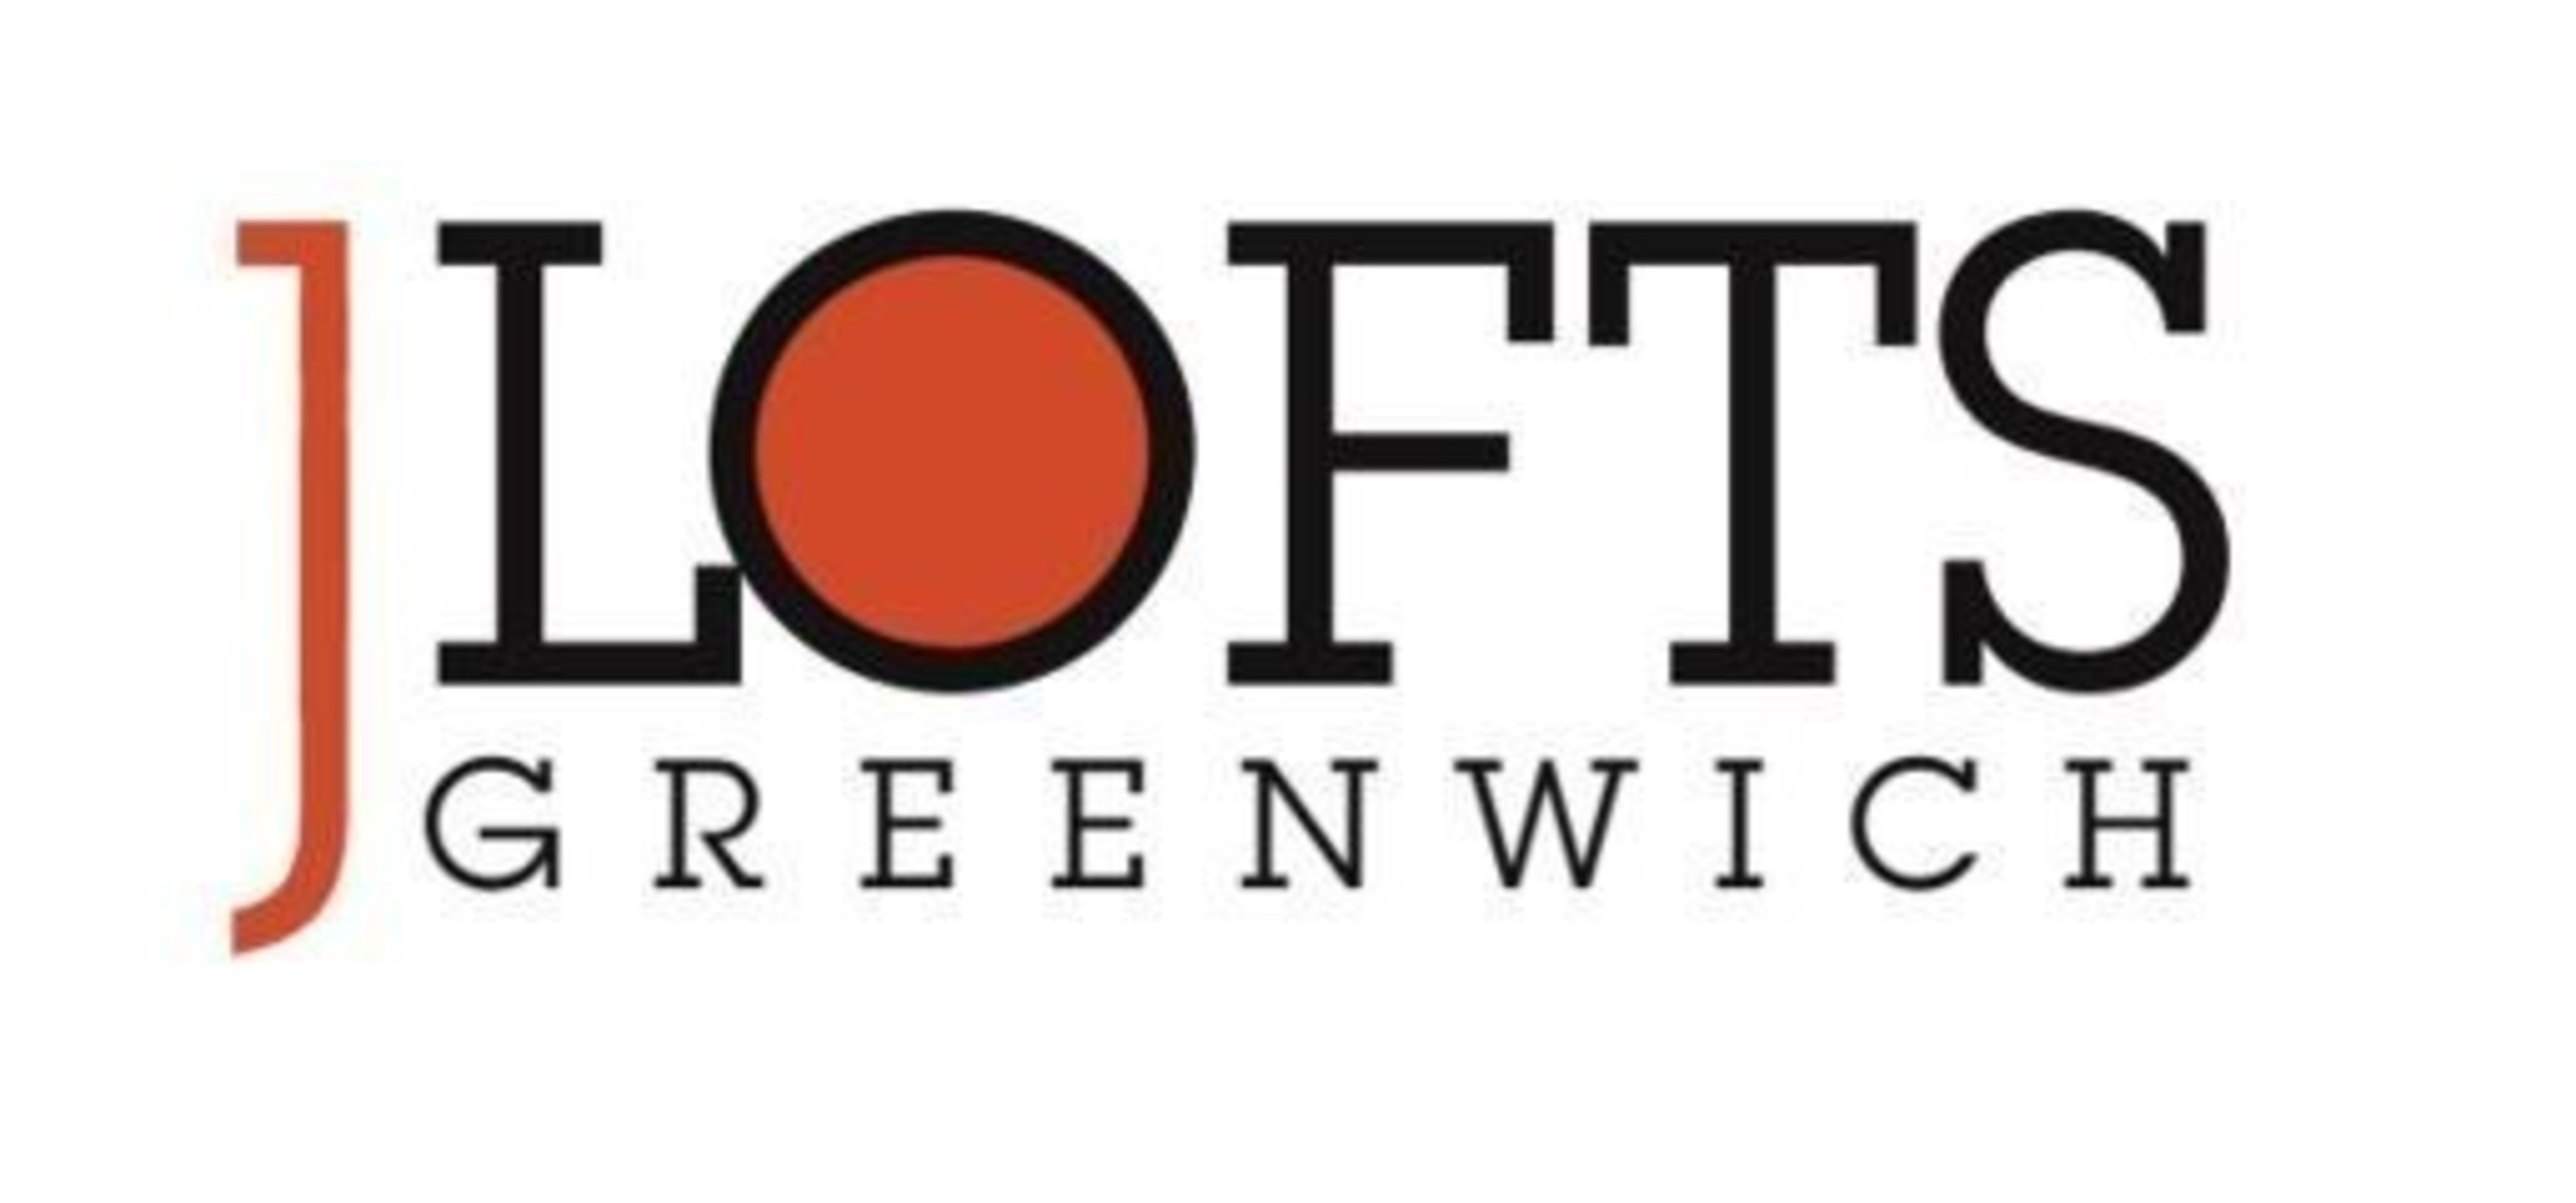 JLofts Greenwich Lists the Top Four Brunch Spots in Greenwich, CT